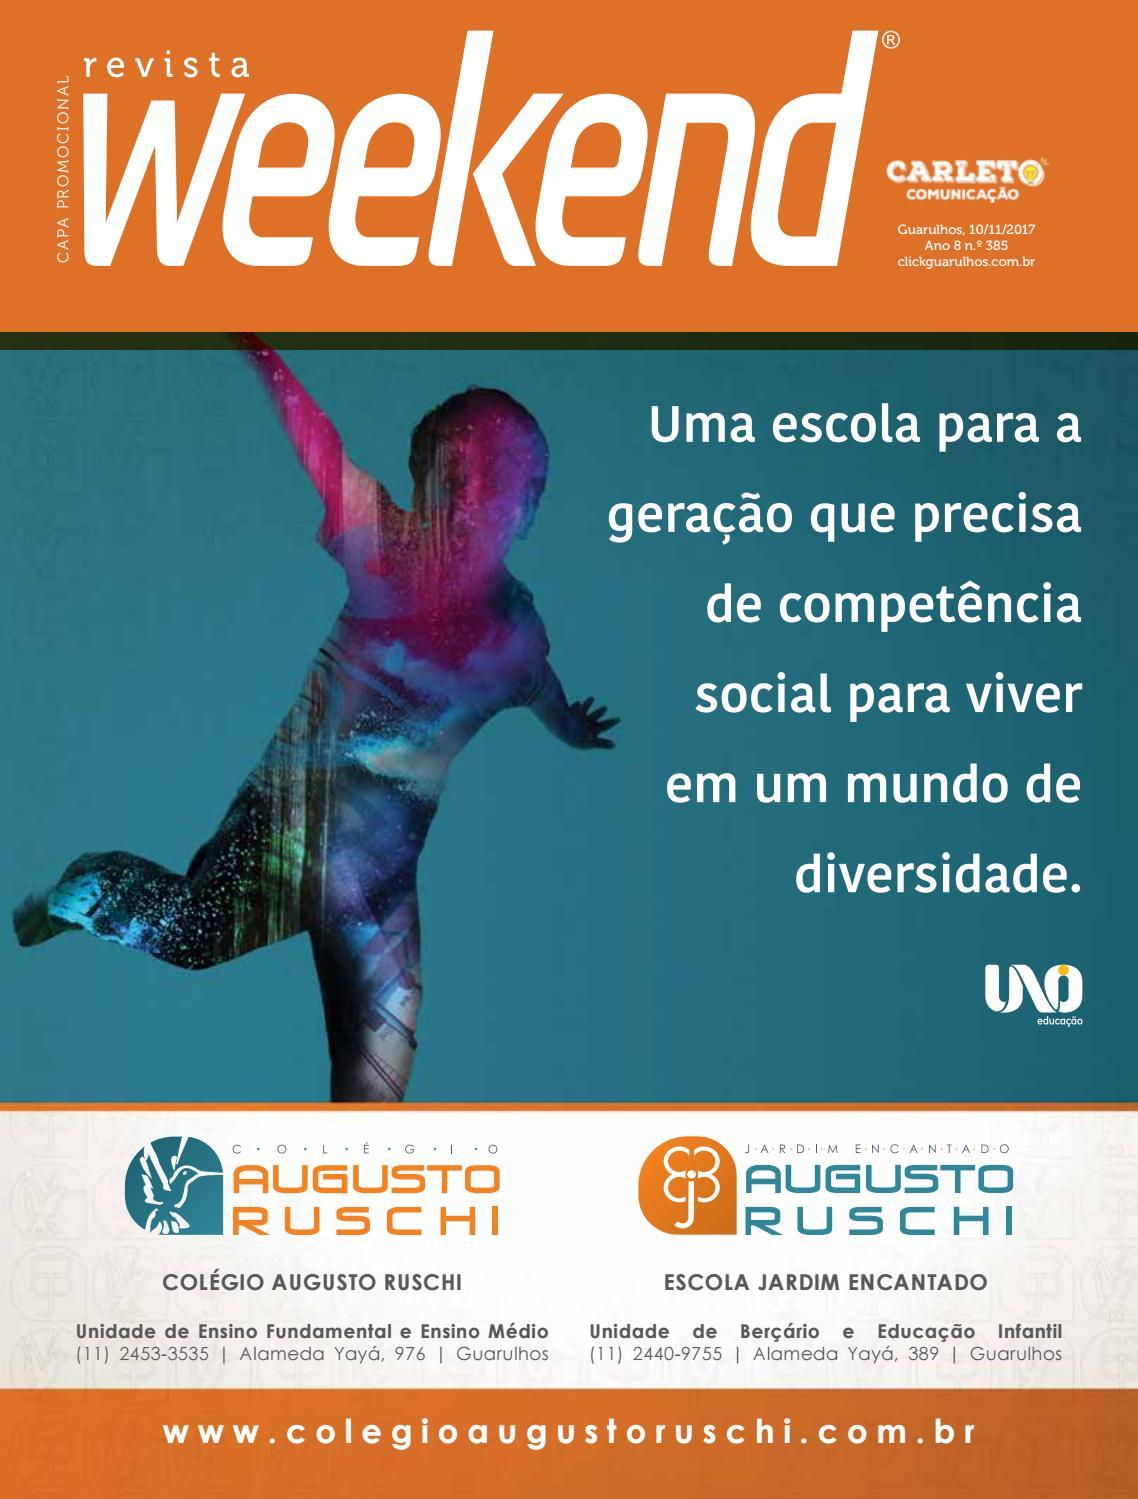 9853eb29140 Revista Weekend - Edição 385 by Carleto Editorial - issuu